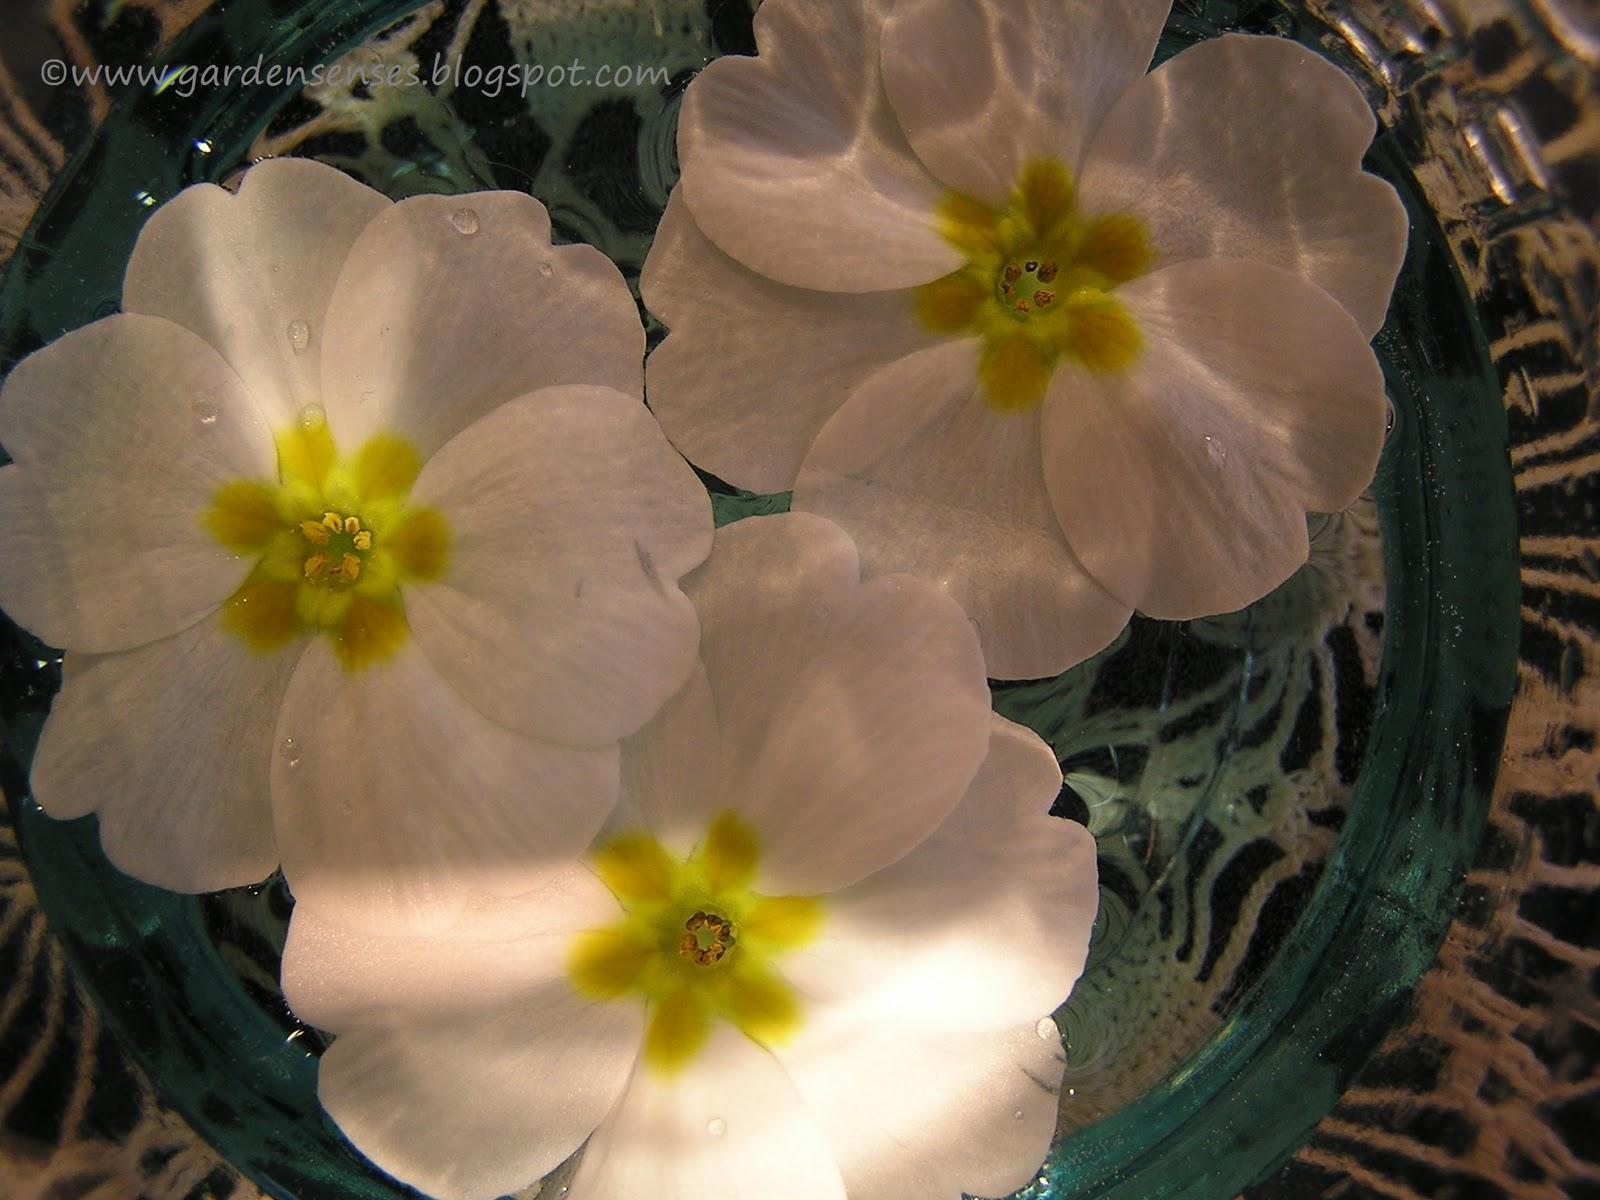 Garden Sense: January 2011